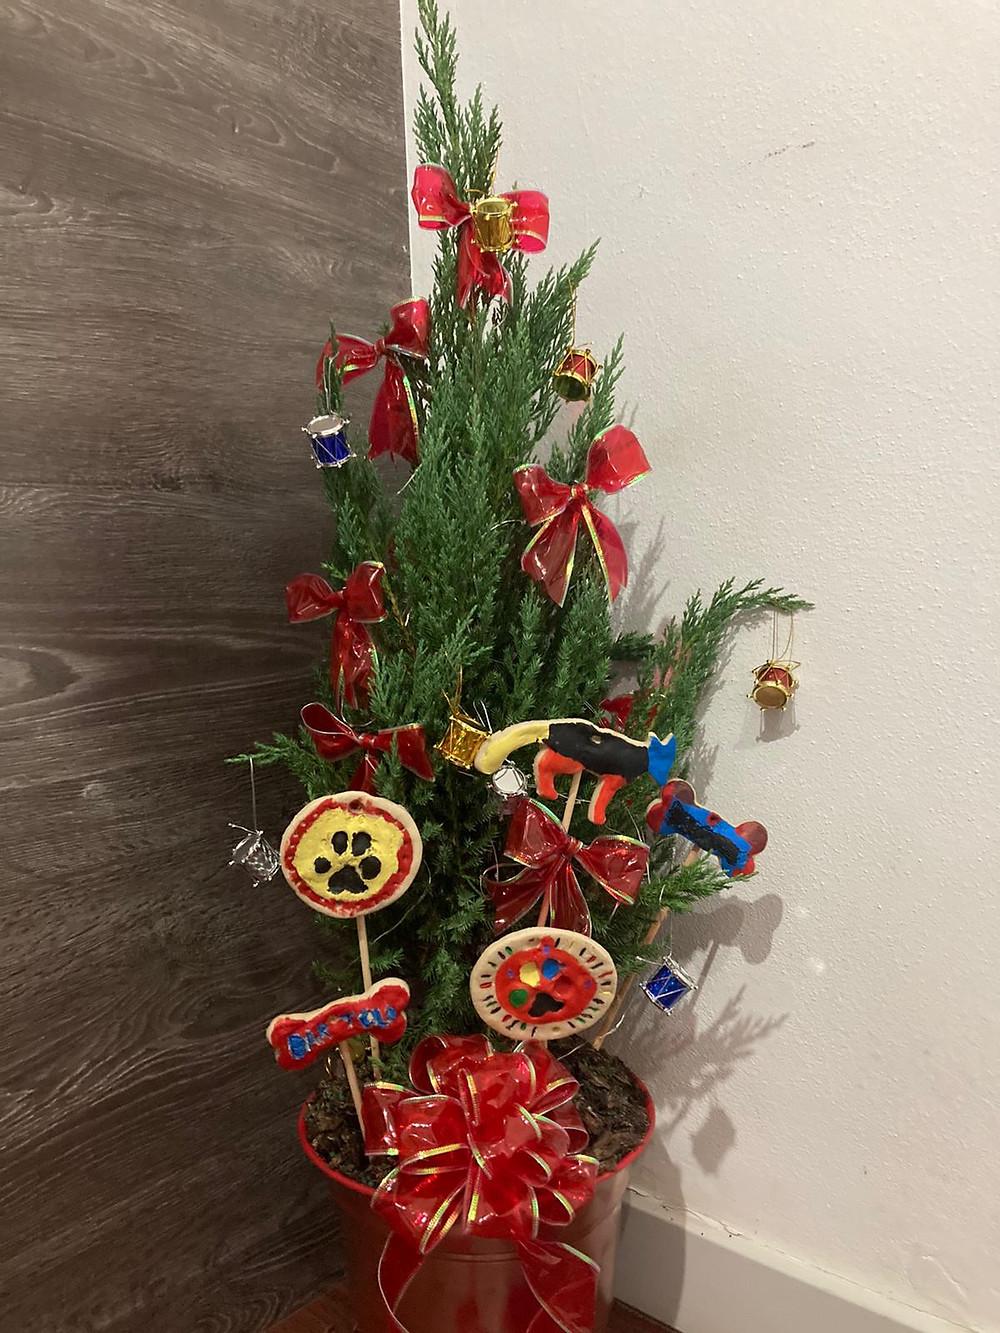 Decorating the Christmas tree with the DIY pet keepsake: Christmas ornaments